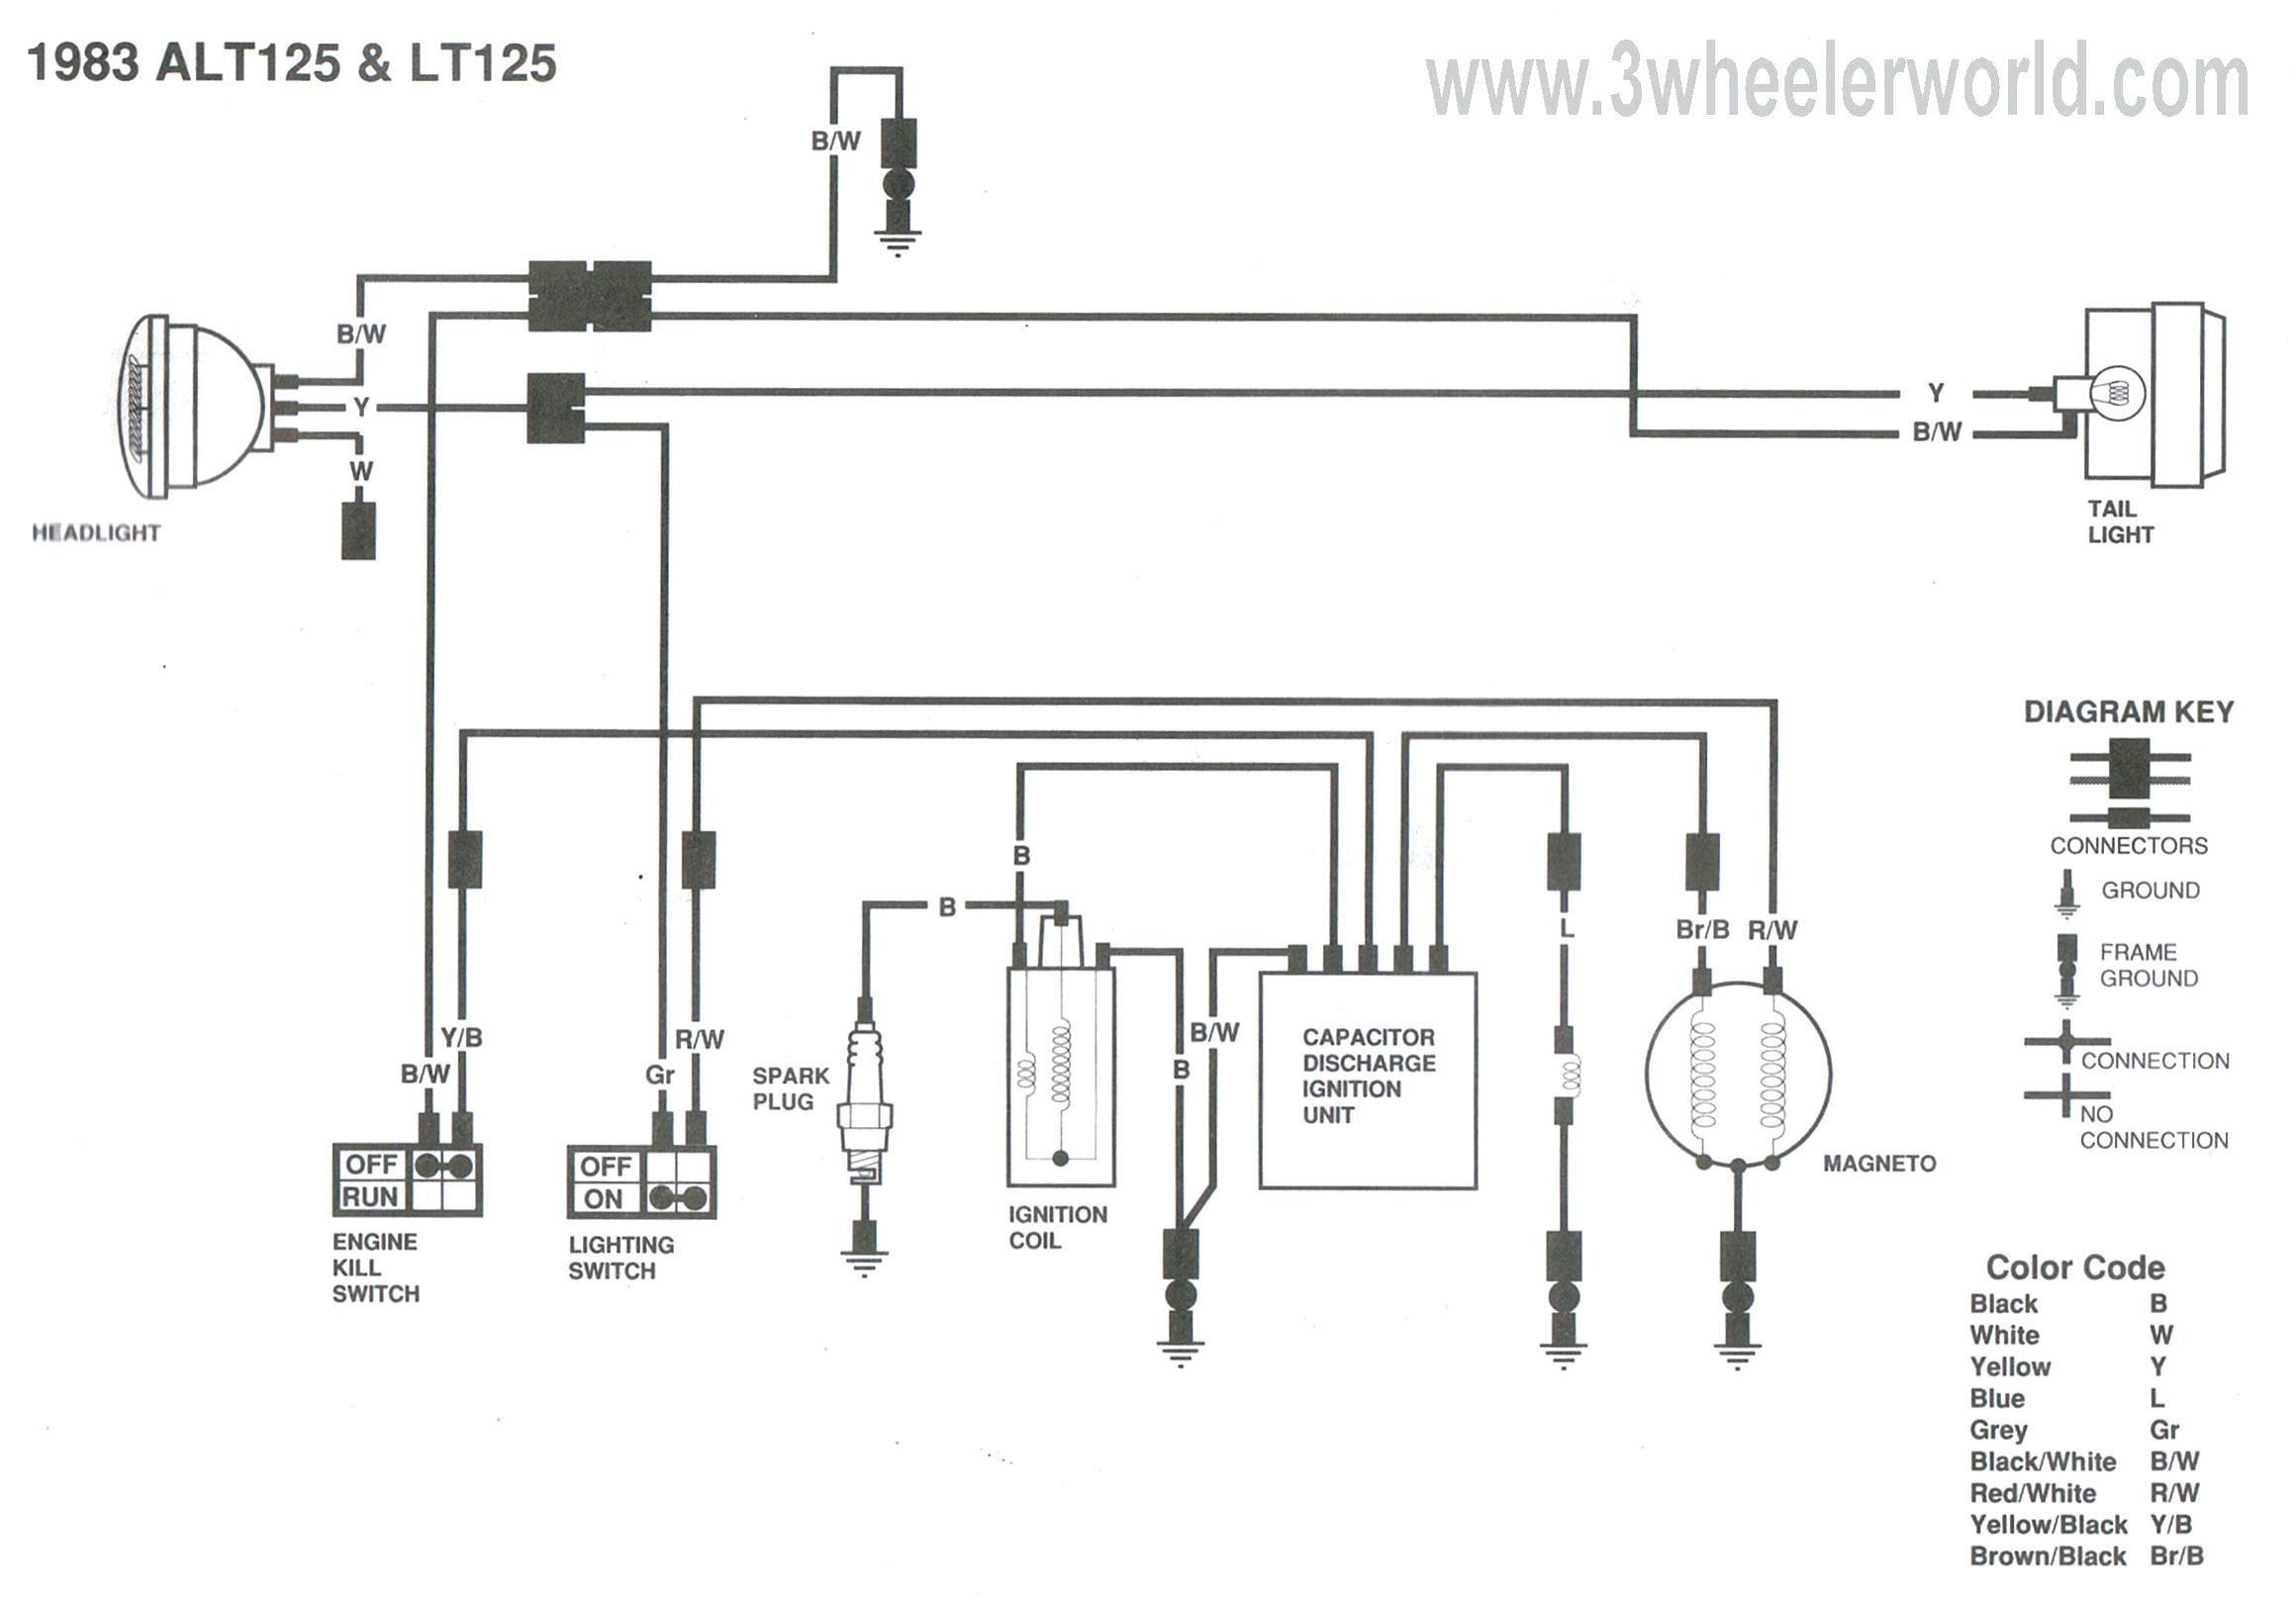 Aprilia Rs 50 Wiring Diagram Explained Diagrams Yz 125 Engine 2000 Rs50 Yz125 Swap Mx